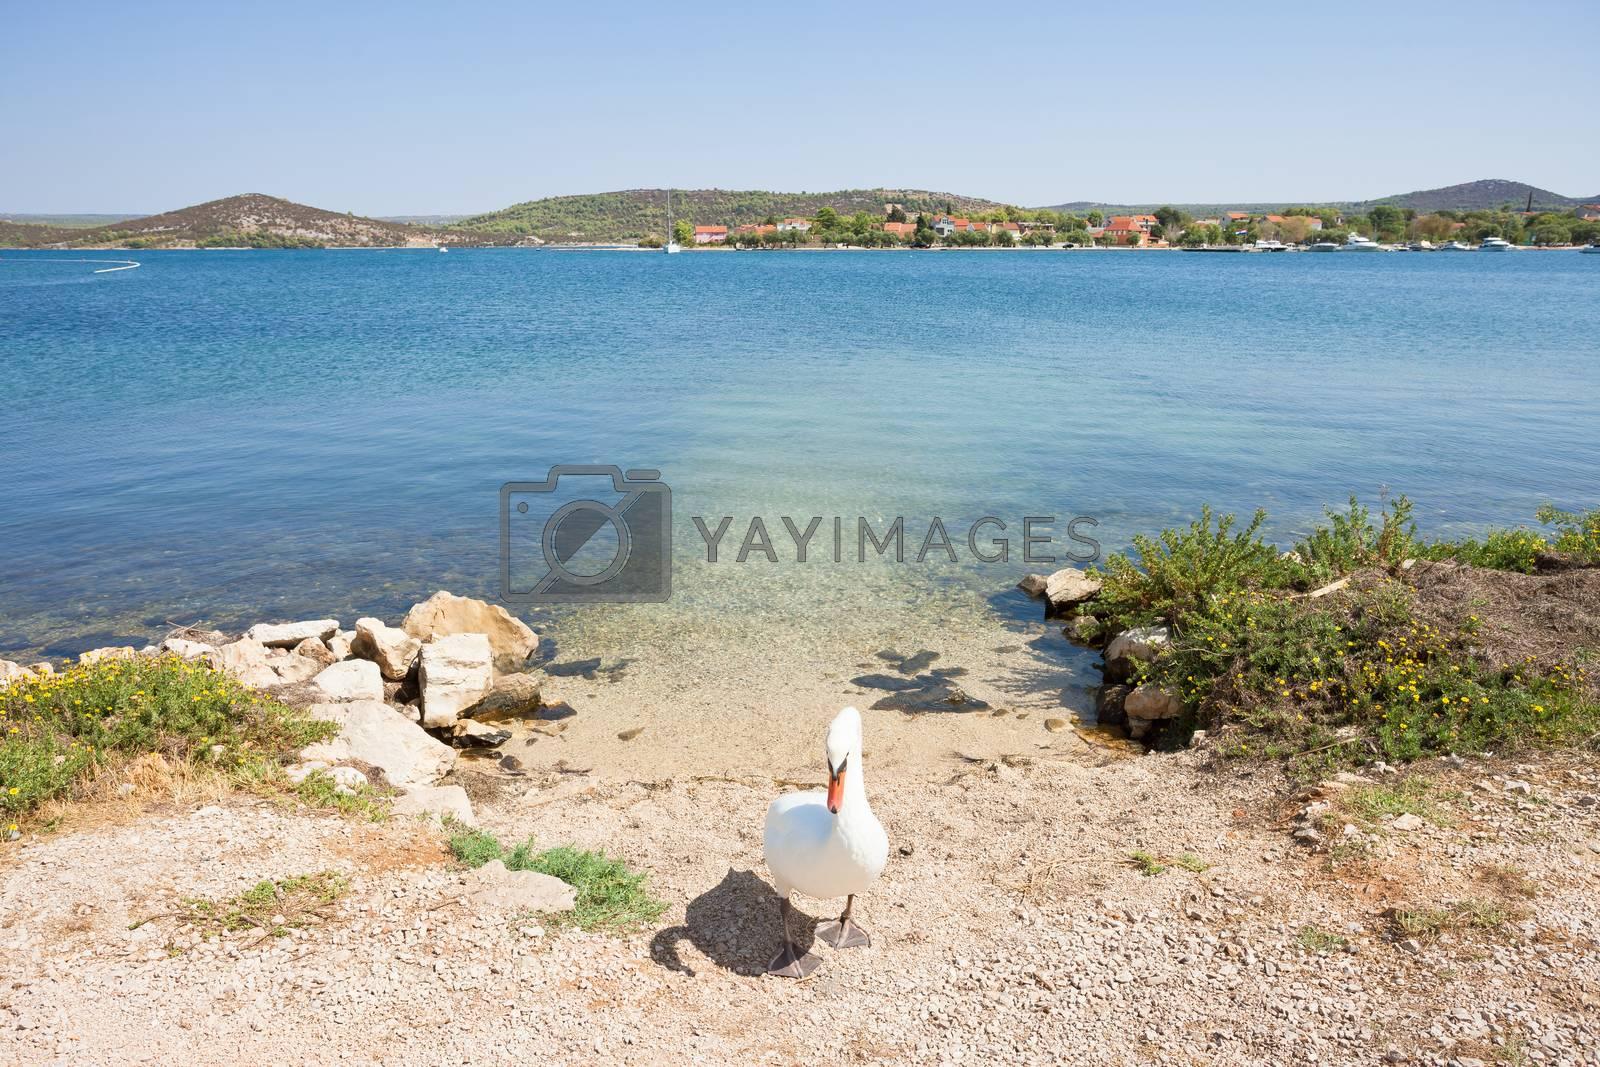 Bilice, Sibenik-Knin, Croatia, Europe - A swan acting as a gate keeper